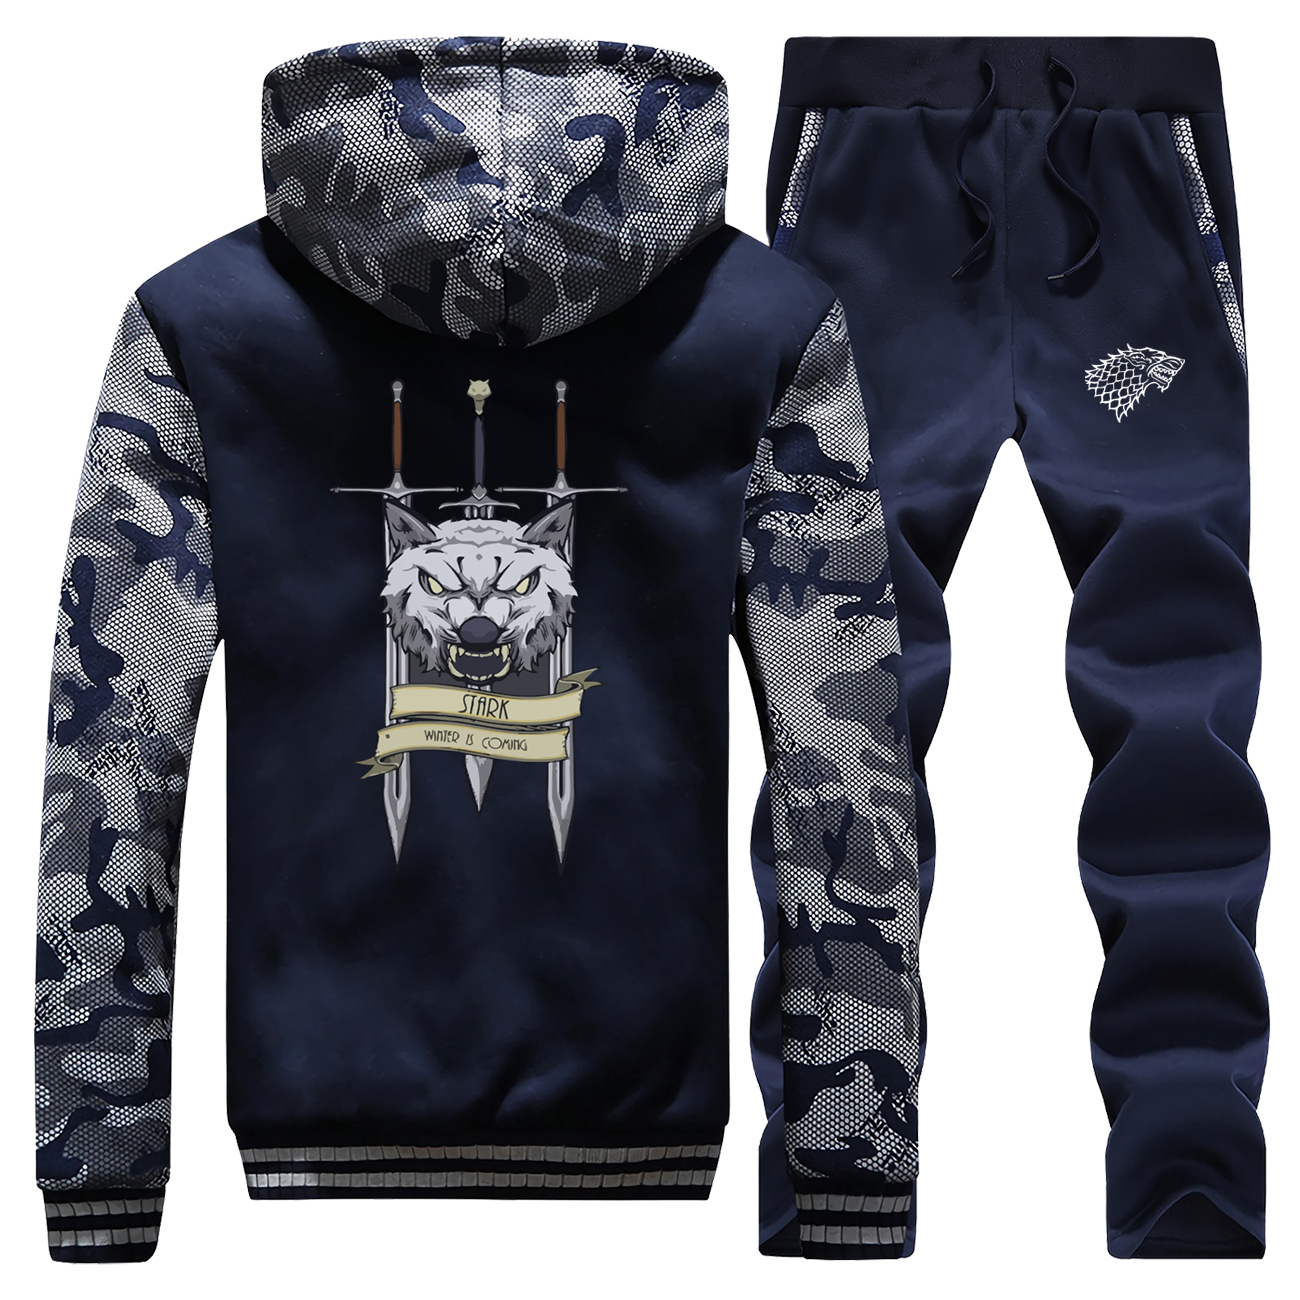 Game Of Thrones Hoodies Pants Set Men Wolf Tracksuit Coat Track Suit Winter Thicken Jacket Camo Sweatshirt Sweatpants 2 PCS Sets